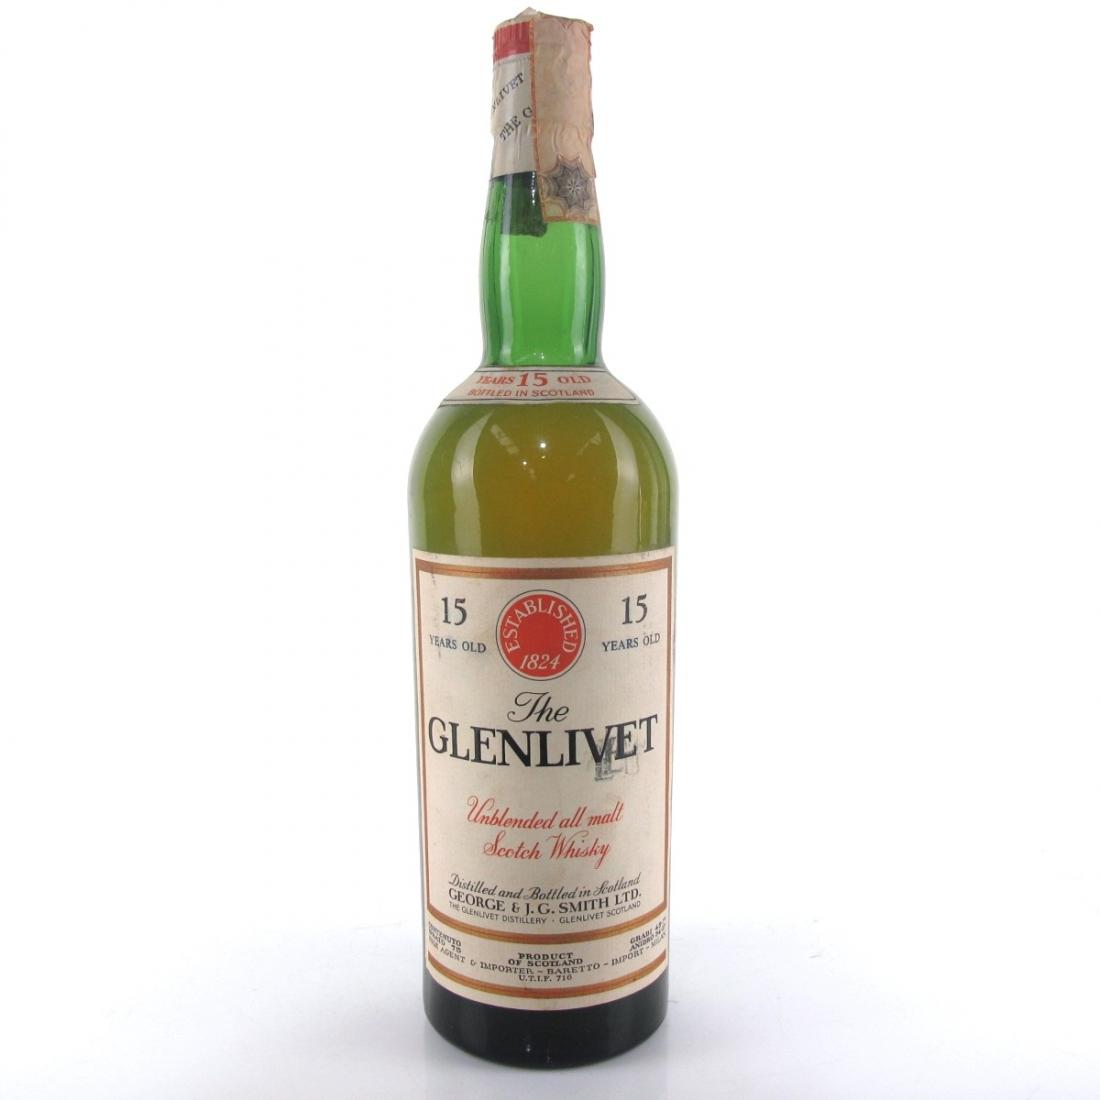 Glenlivet 15 Year Old 1960s / Baretto Import